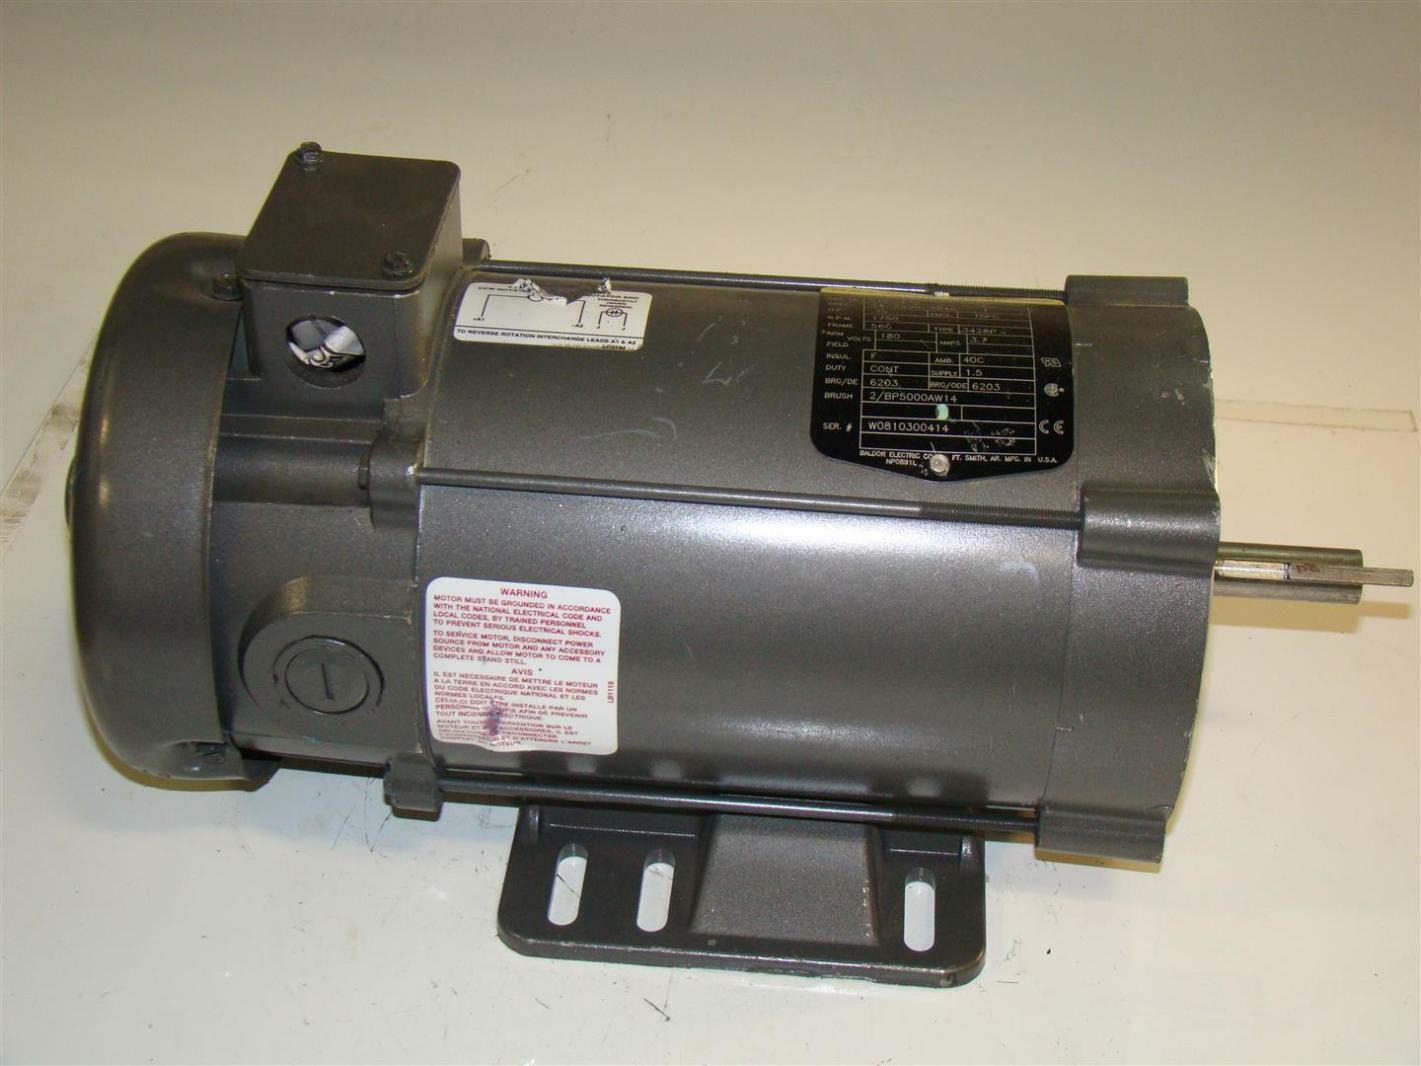 Baldor reliancer dc electric motor 75hp 1750rpm 180v for 180v dc motor suppliers